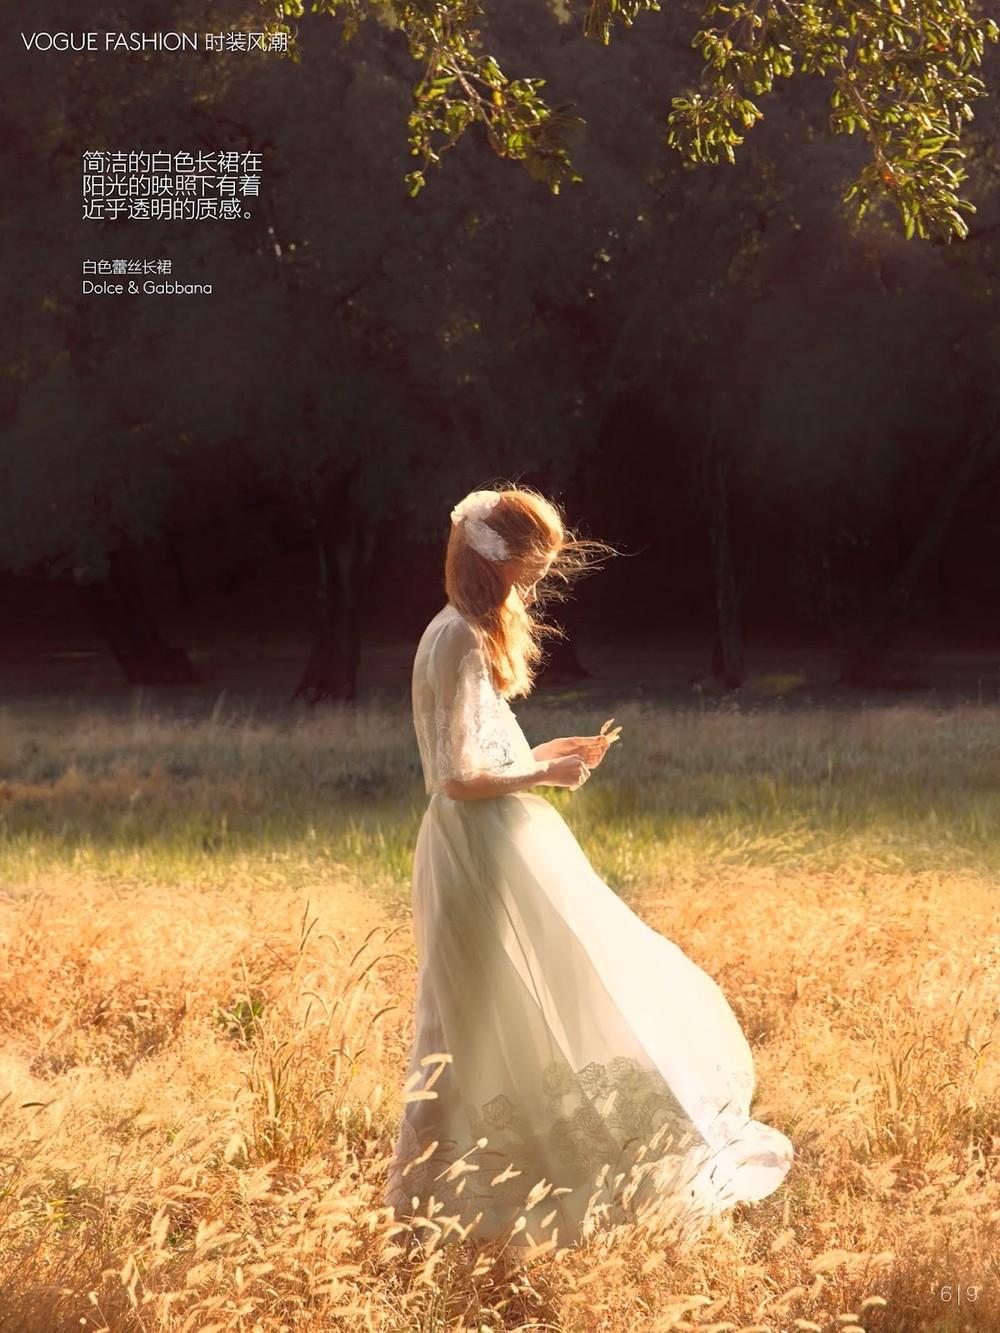 Julia-Hafstrom-by-Camilla-Akrans-for-Vogue-China-May-2014-5.jpg